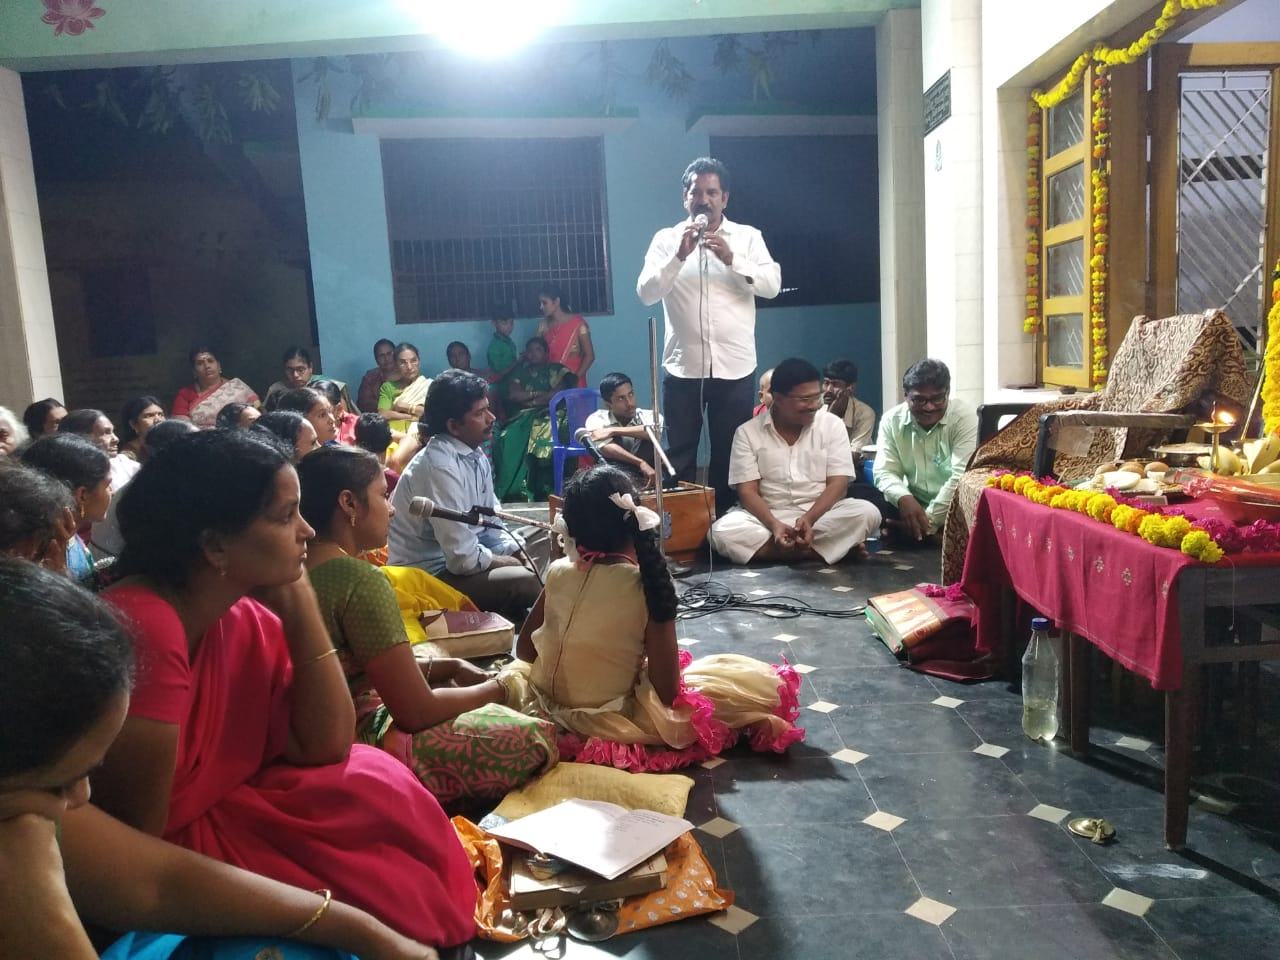 05-KarthikaMasam-Aaradhana-Aacchampeta-27112019